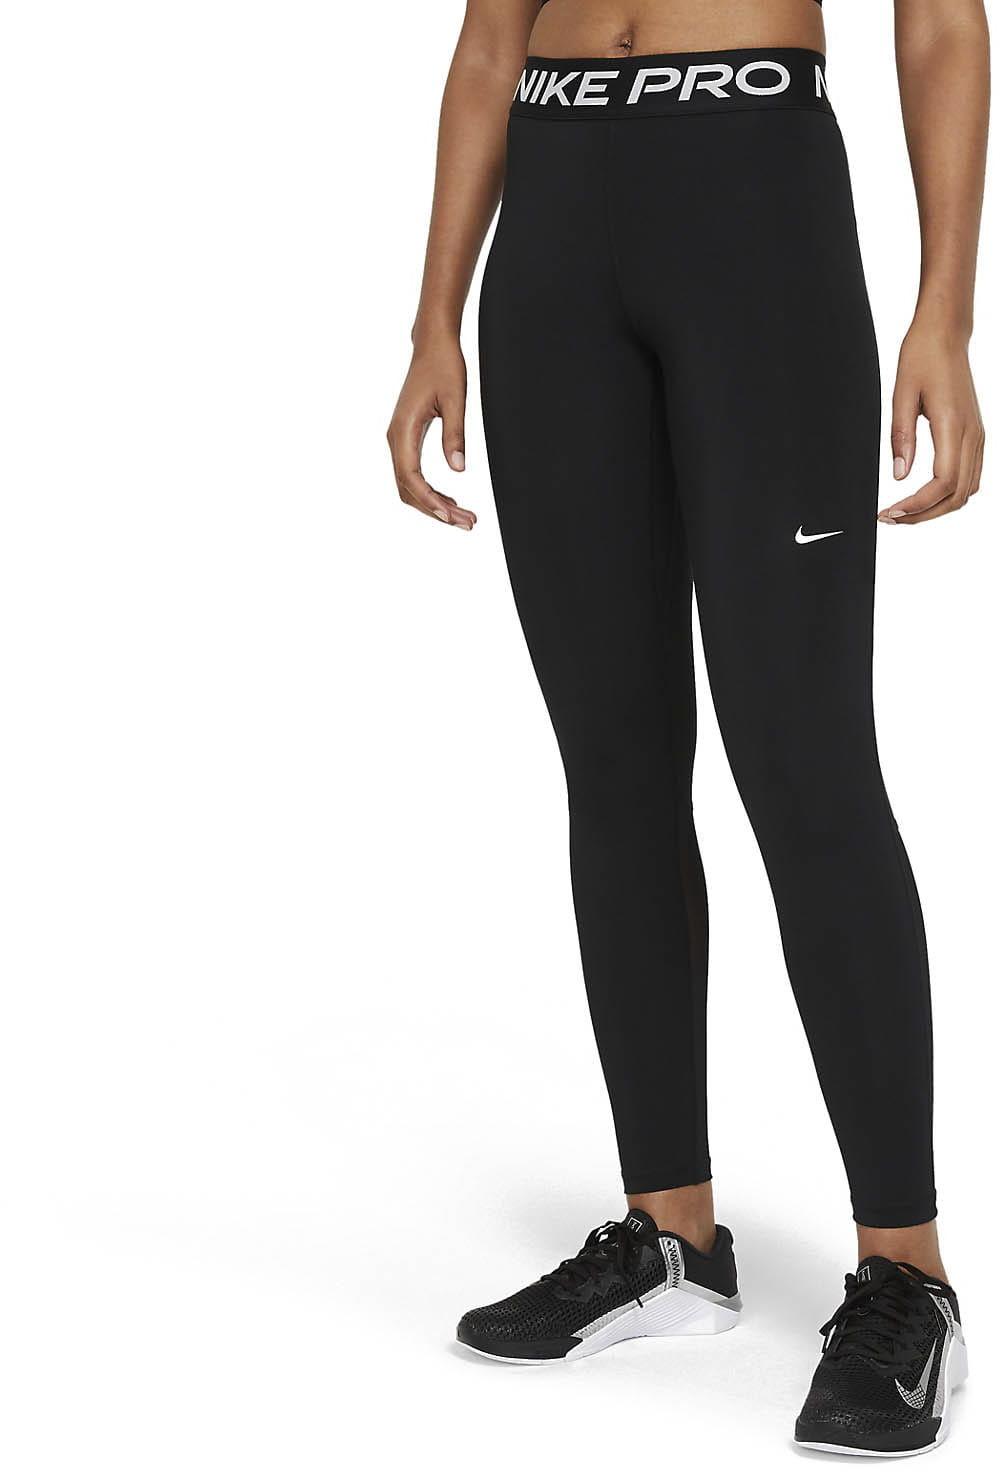 Legginsy damskie spodnie Nike rozm L - 173 cm